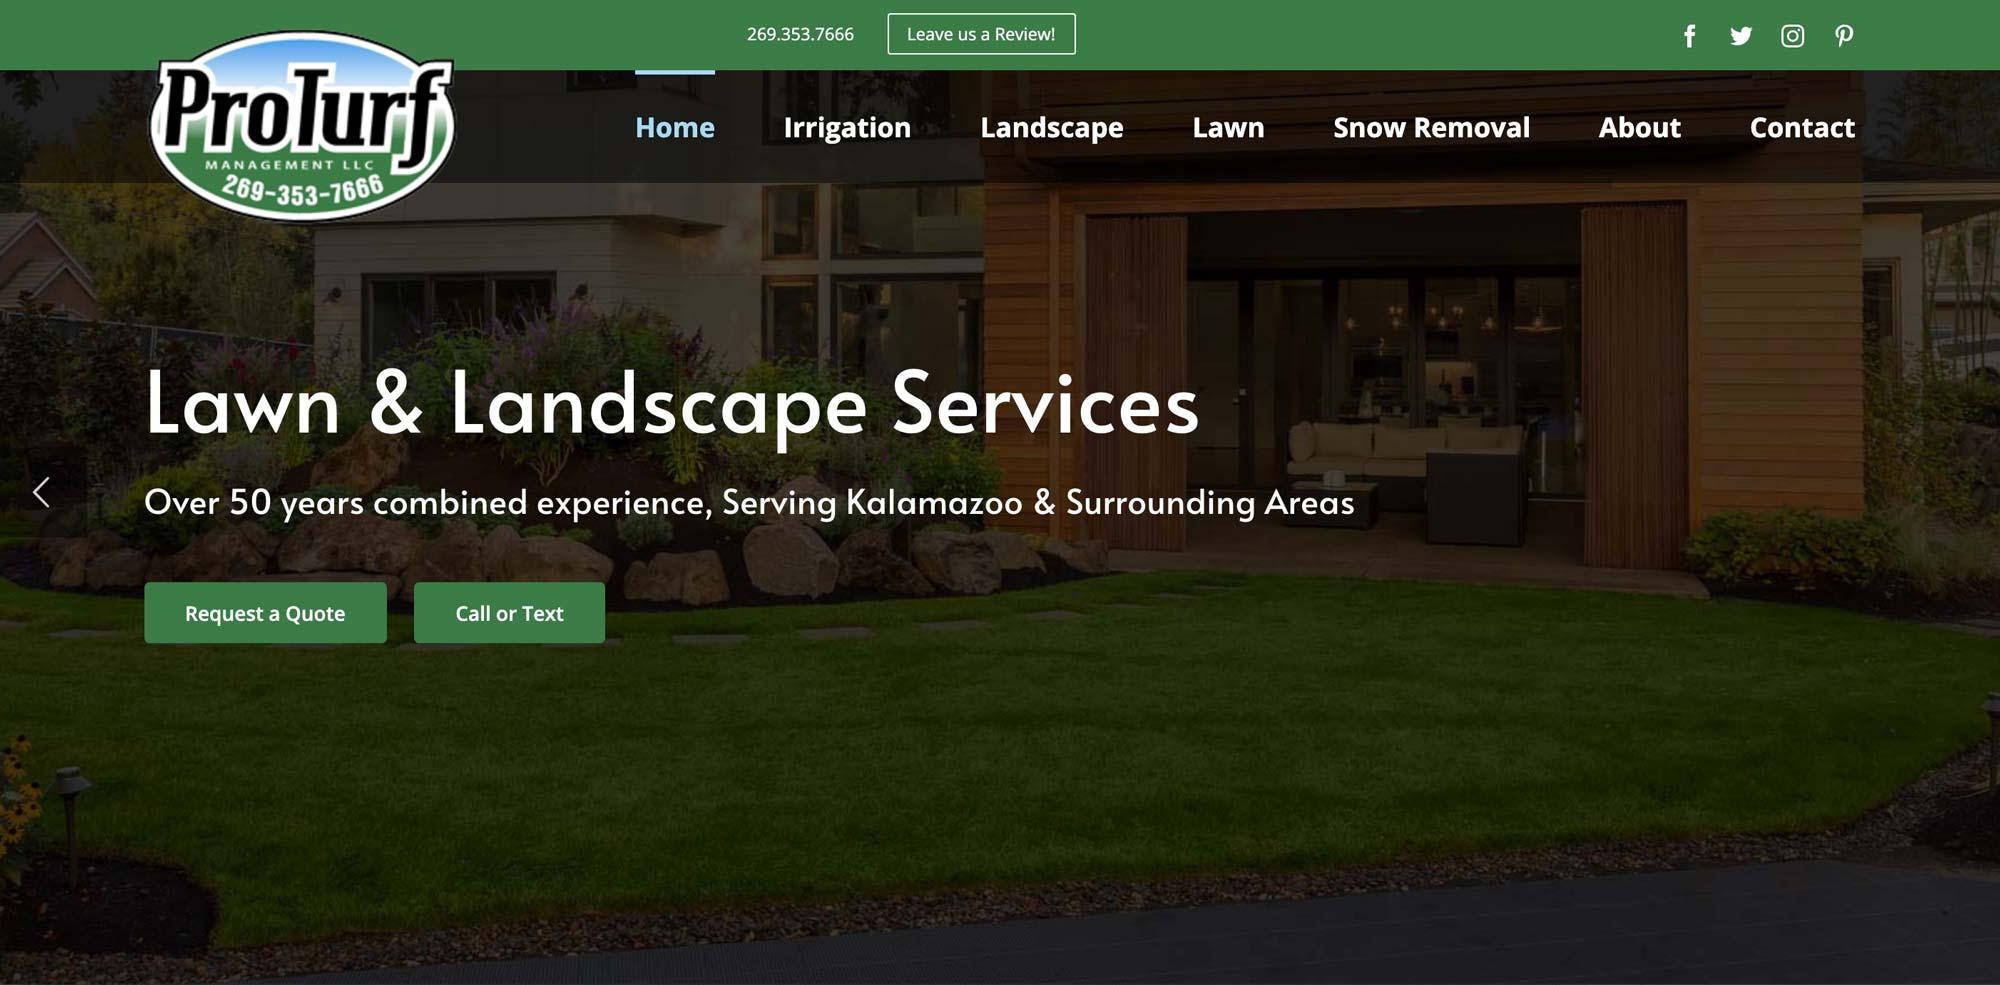 website design for lawncare-service